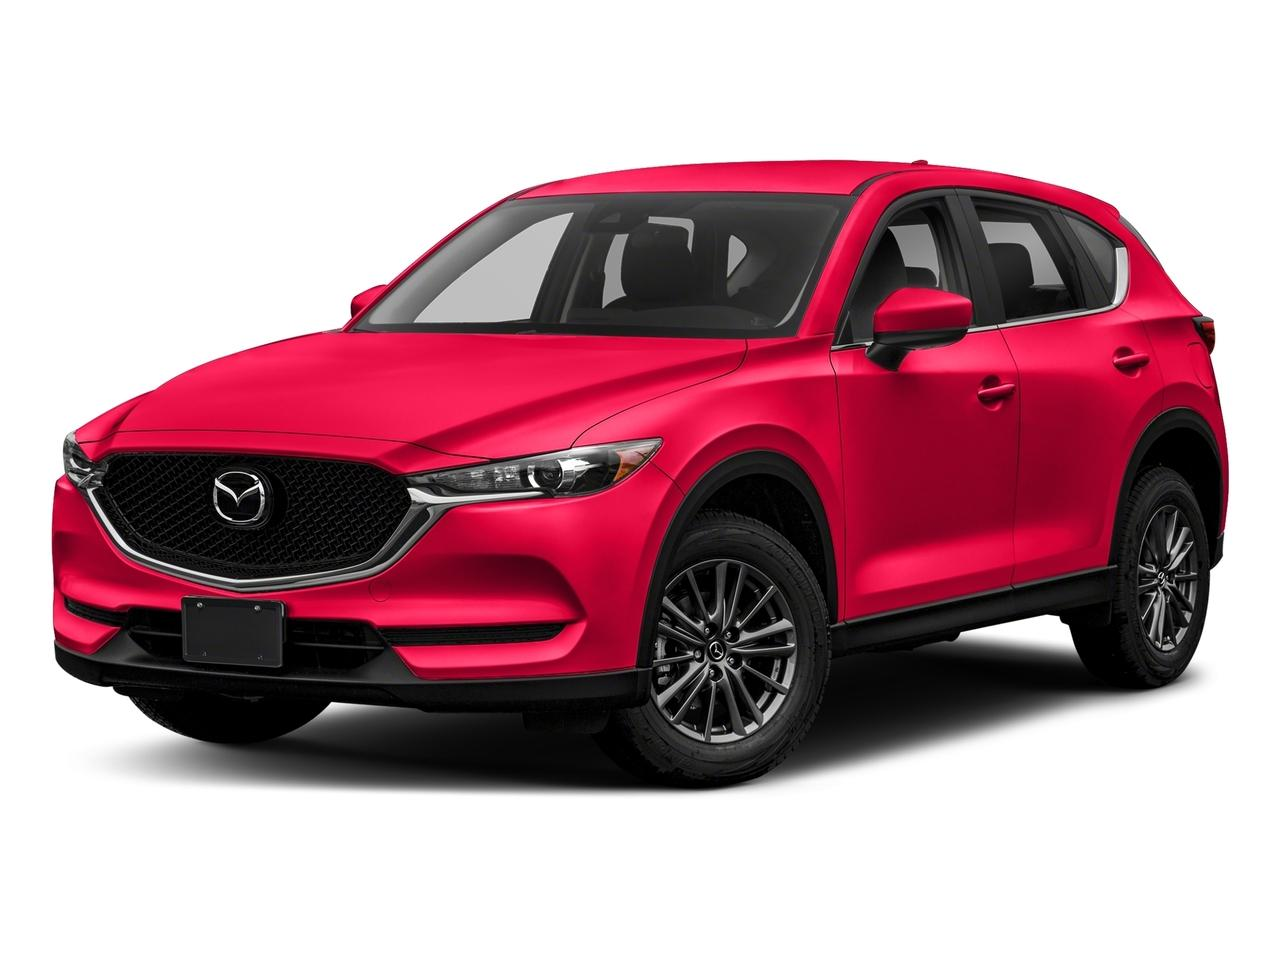 2018 Mazda CX-5 Vehicle Photo in TEMPLE, TX 76504-3447